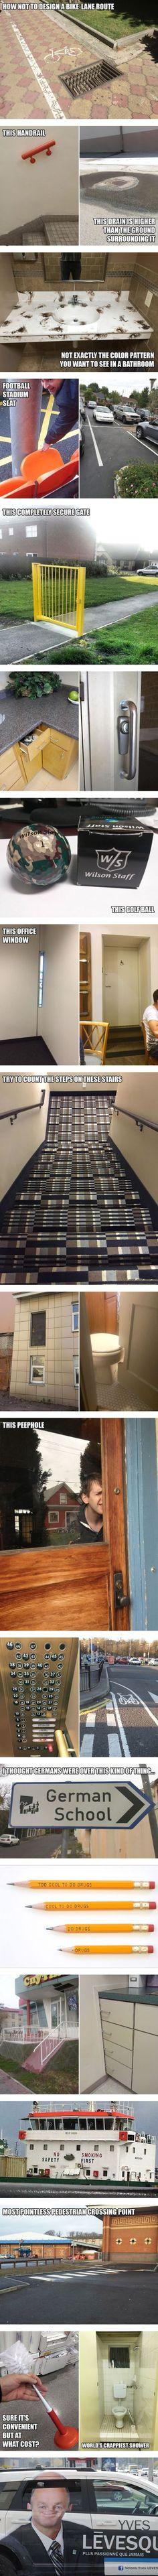 Brilliant Examples of Terrible Design